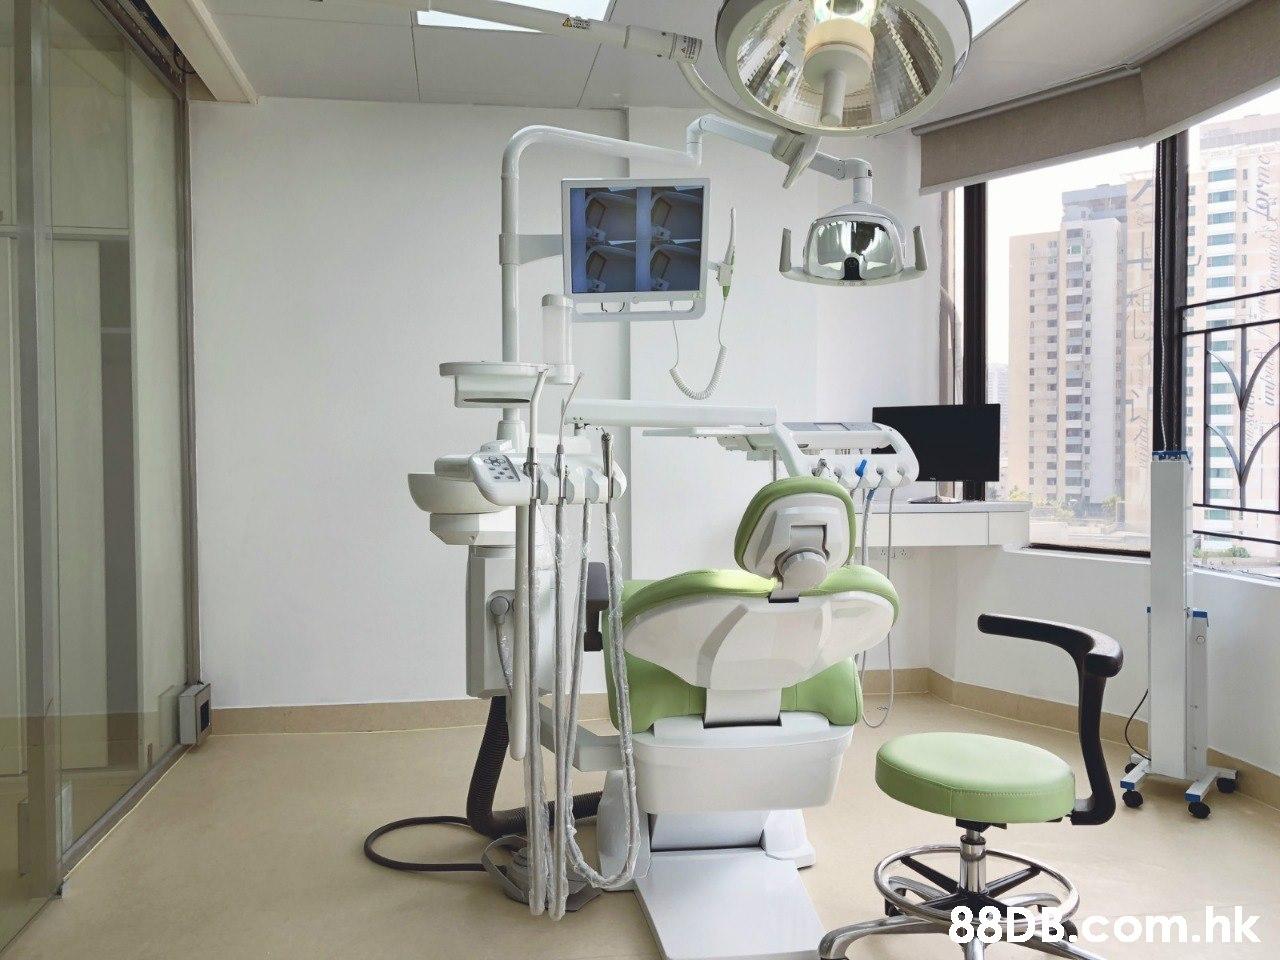 Eb 8 com.hk  Hospital,Medical equipment,Room,Clinic,Health care